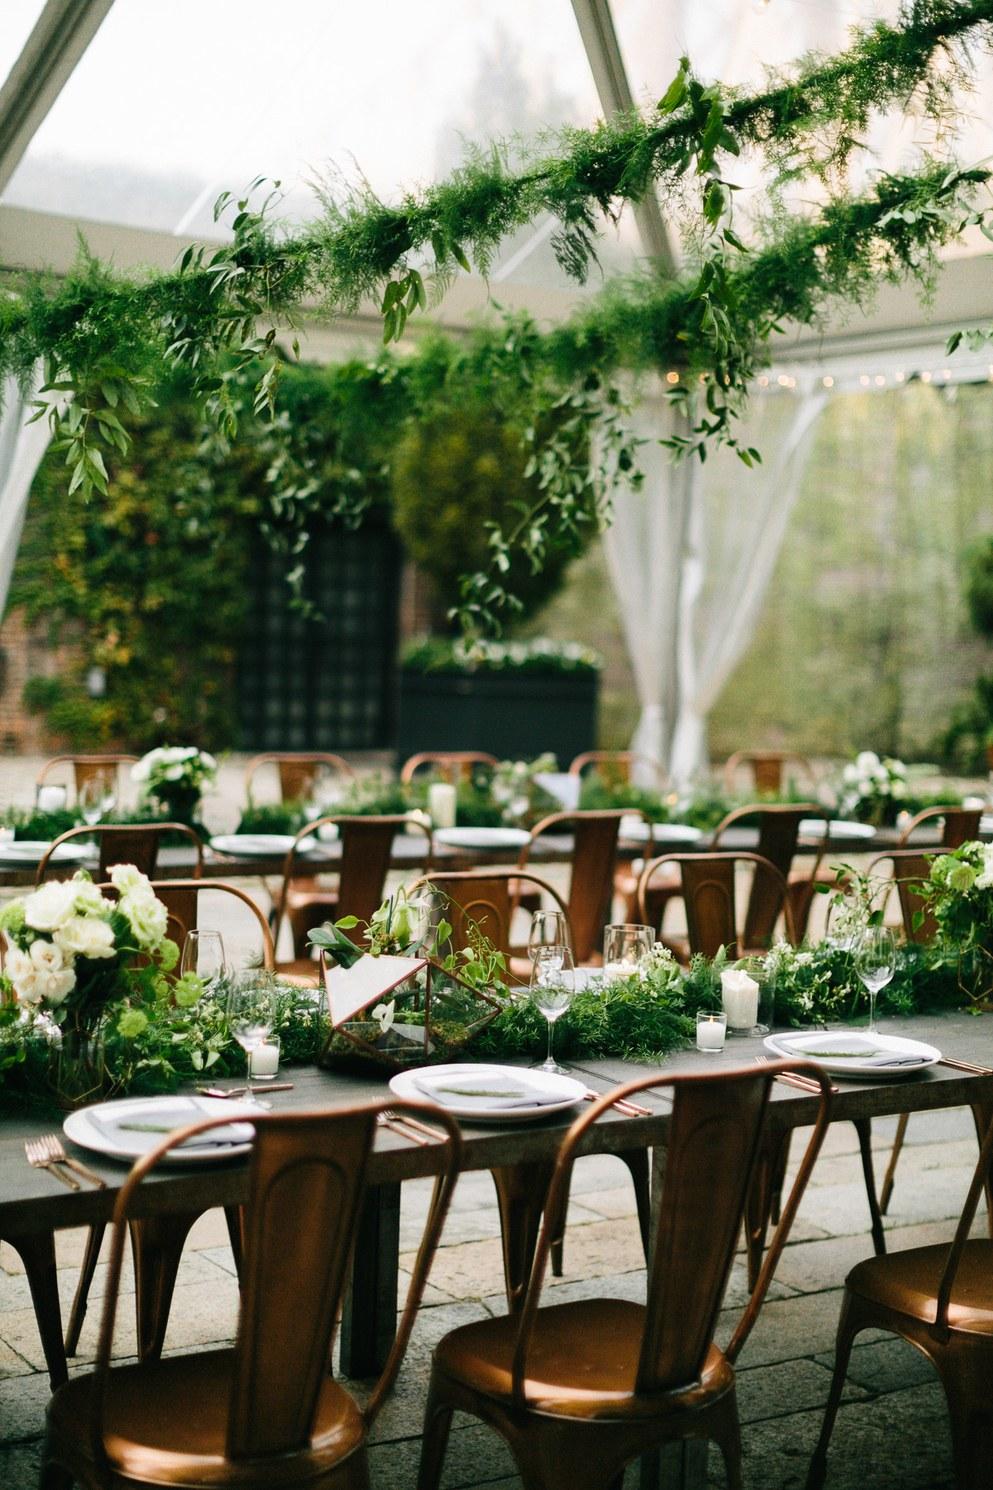 Greenery garlands in a transparent wedding tent. Photo by Chaz Cruz via Brides.com